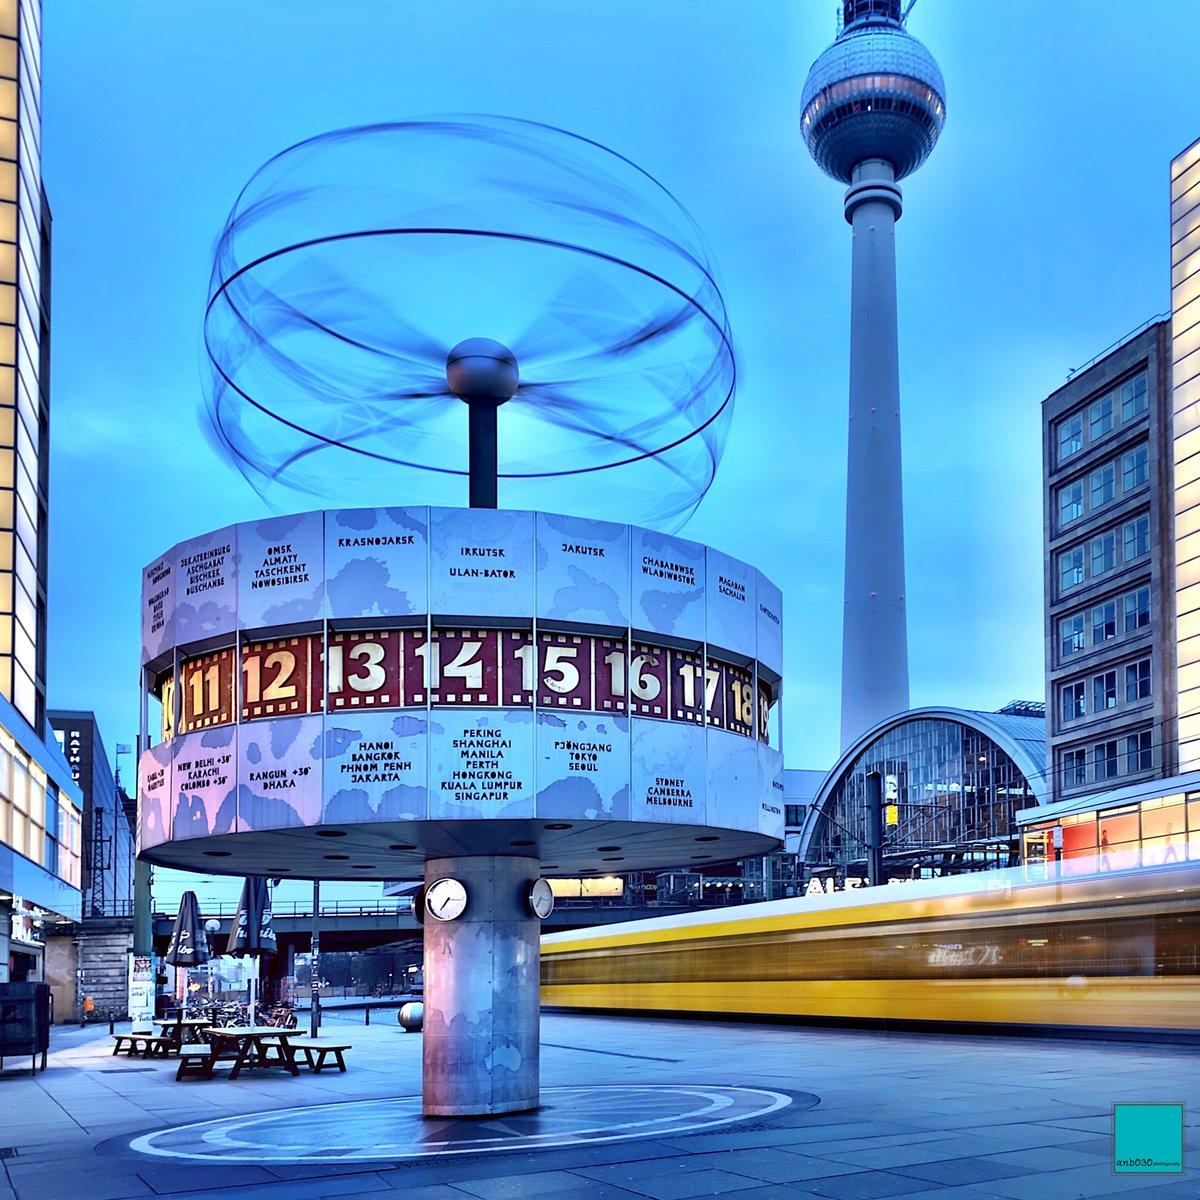 Morgens um 7 Uhr am #Alexanderplatz #Berlin!   @BVG_Kampagne #tram #Straßenbahn #berlinpage #diestadtberlin #weilwirdichlieben #topberlinphoto #visitberlin #urbanandstreet #urbanromantix #shotoniphone #Germany #travel #CityLife #BerlinLife #iPhone #StreetPhotography #longexposurepic.twitter.com/t2JEXJEyrn